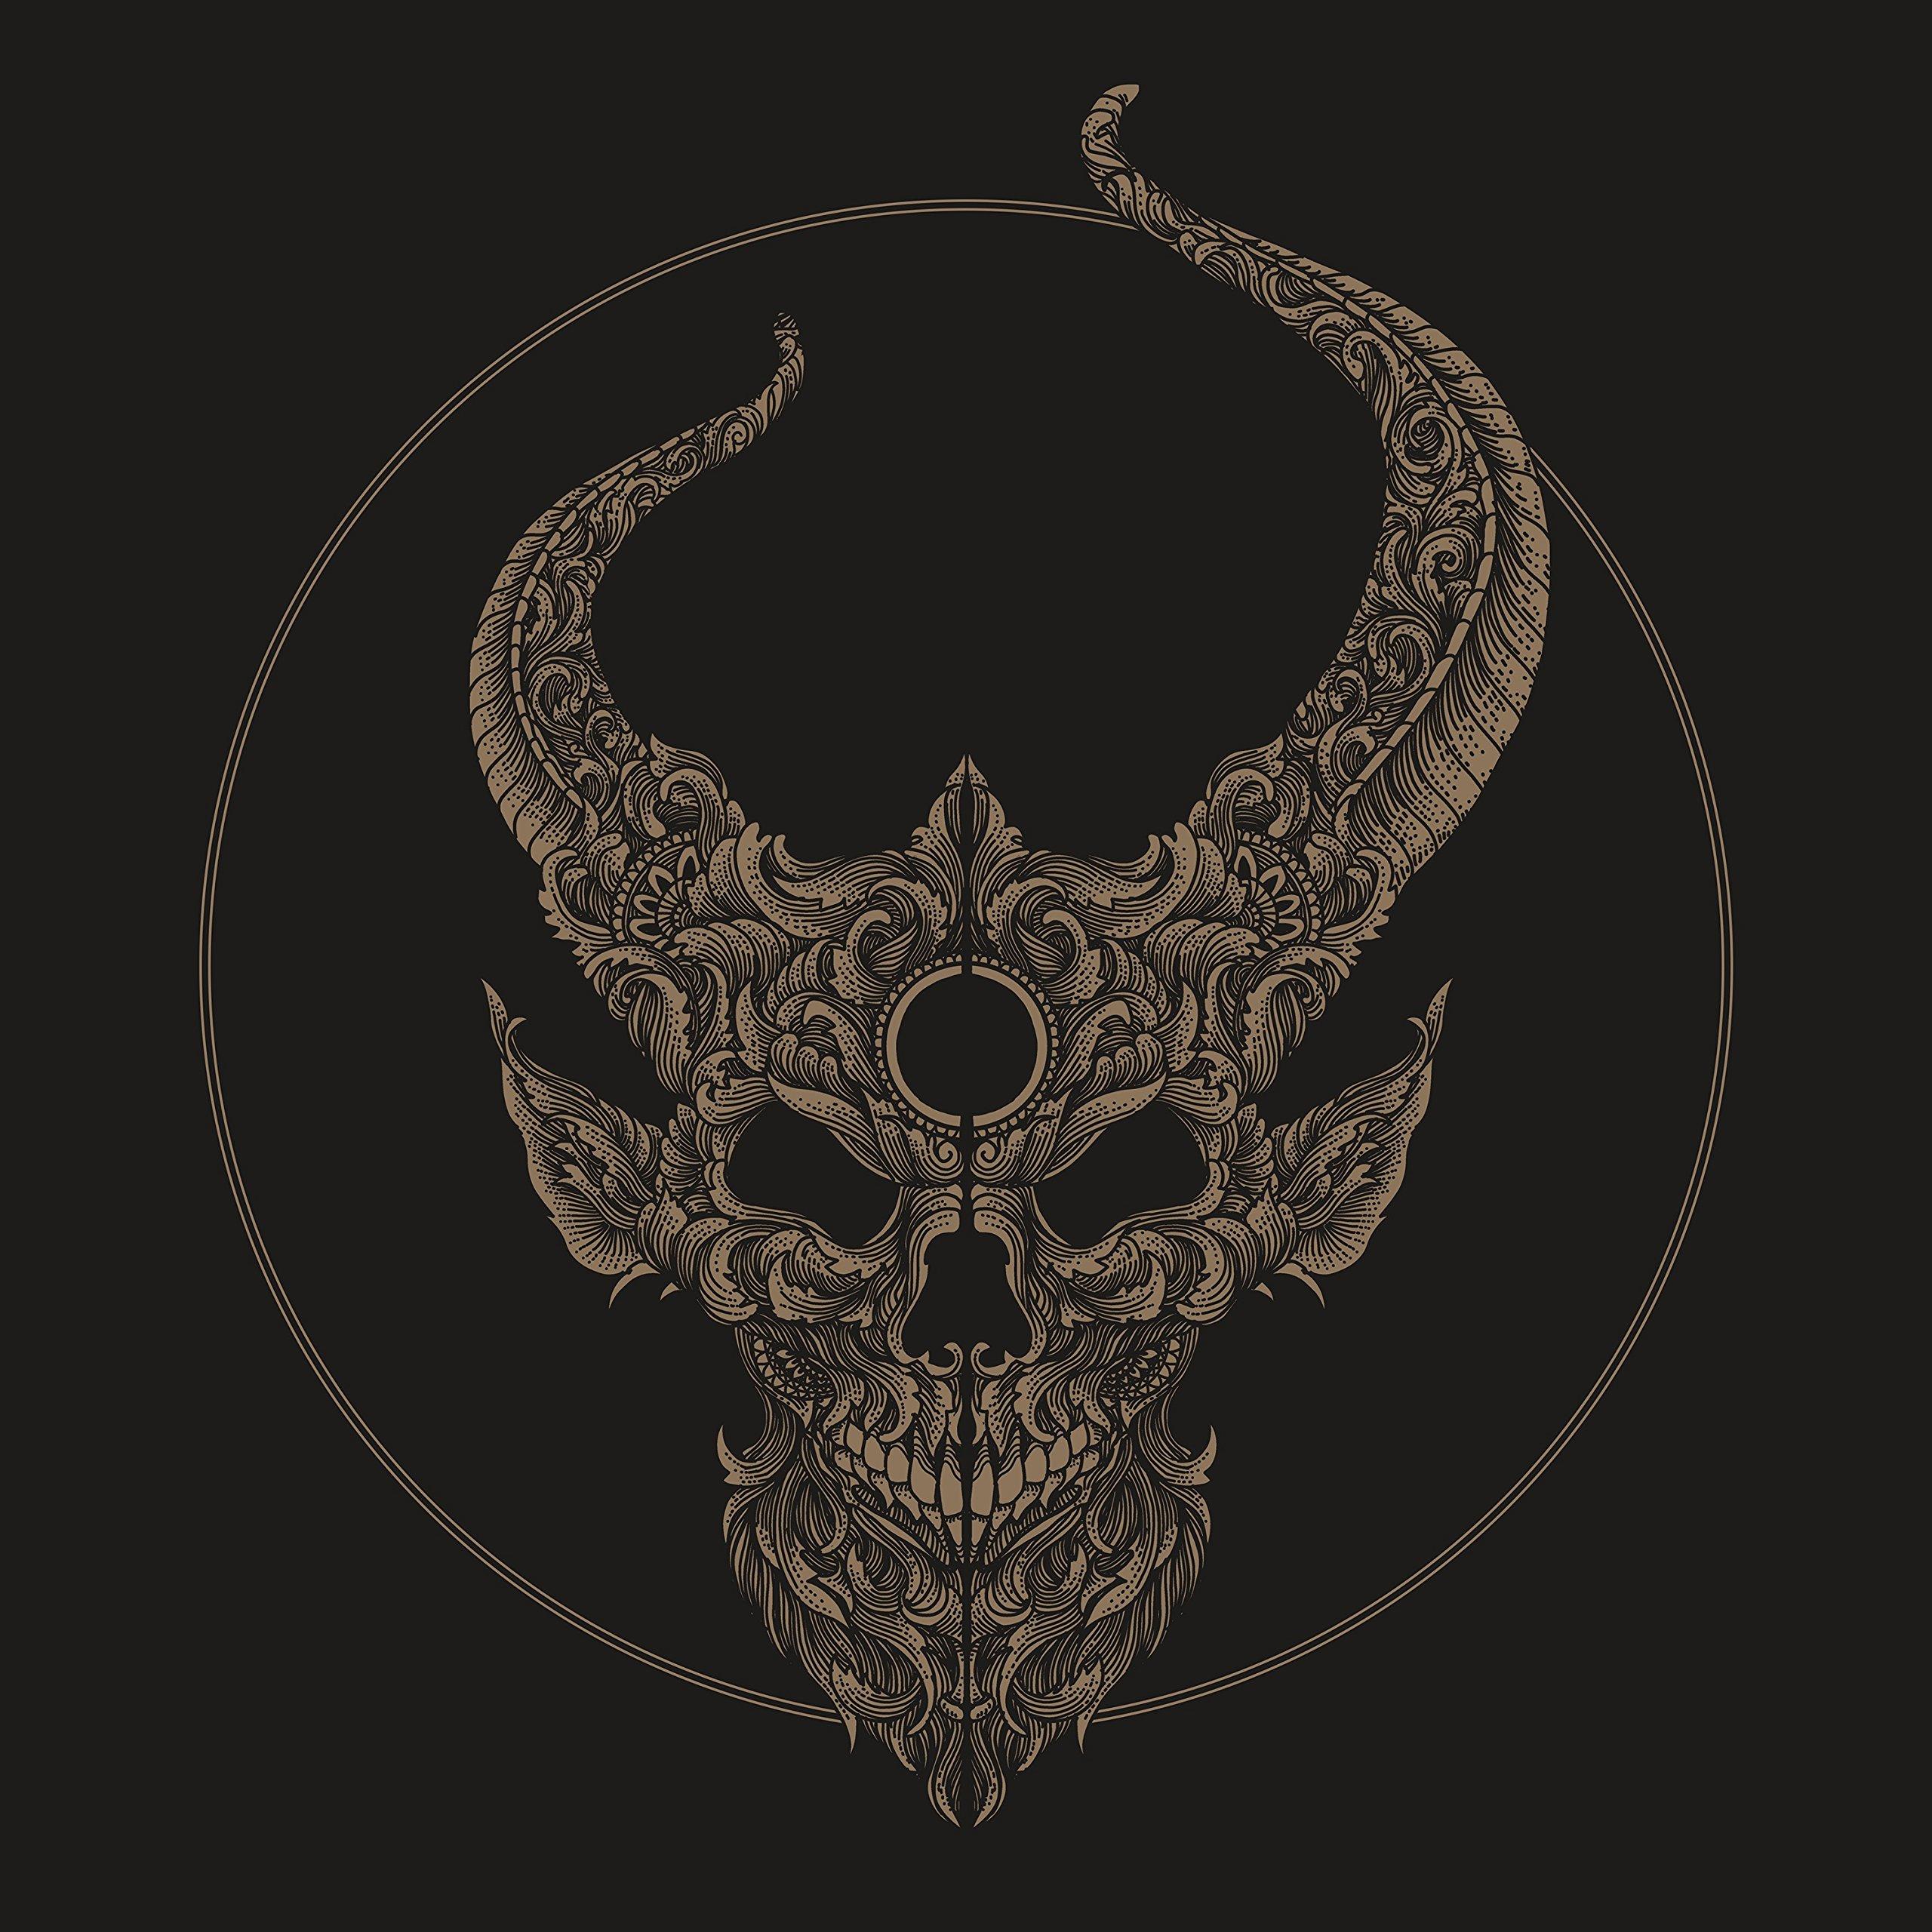 CD : Demon Hunter - Outlive (CD)